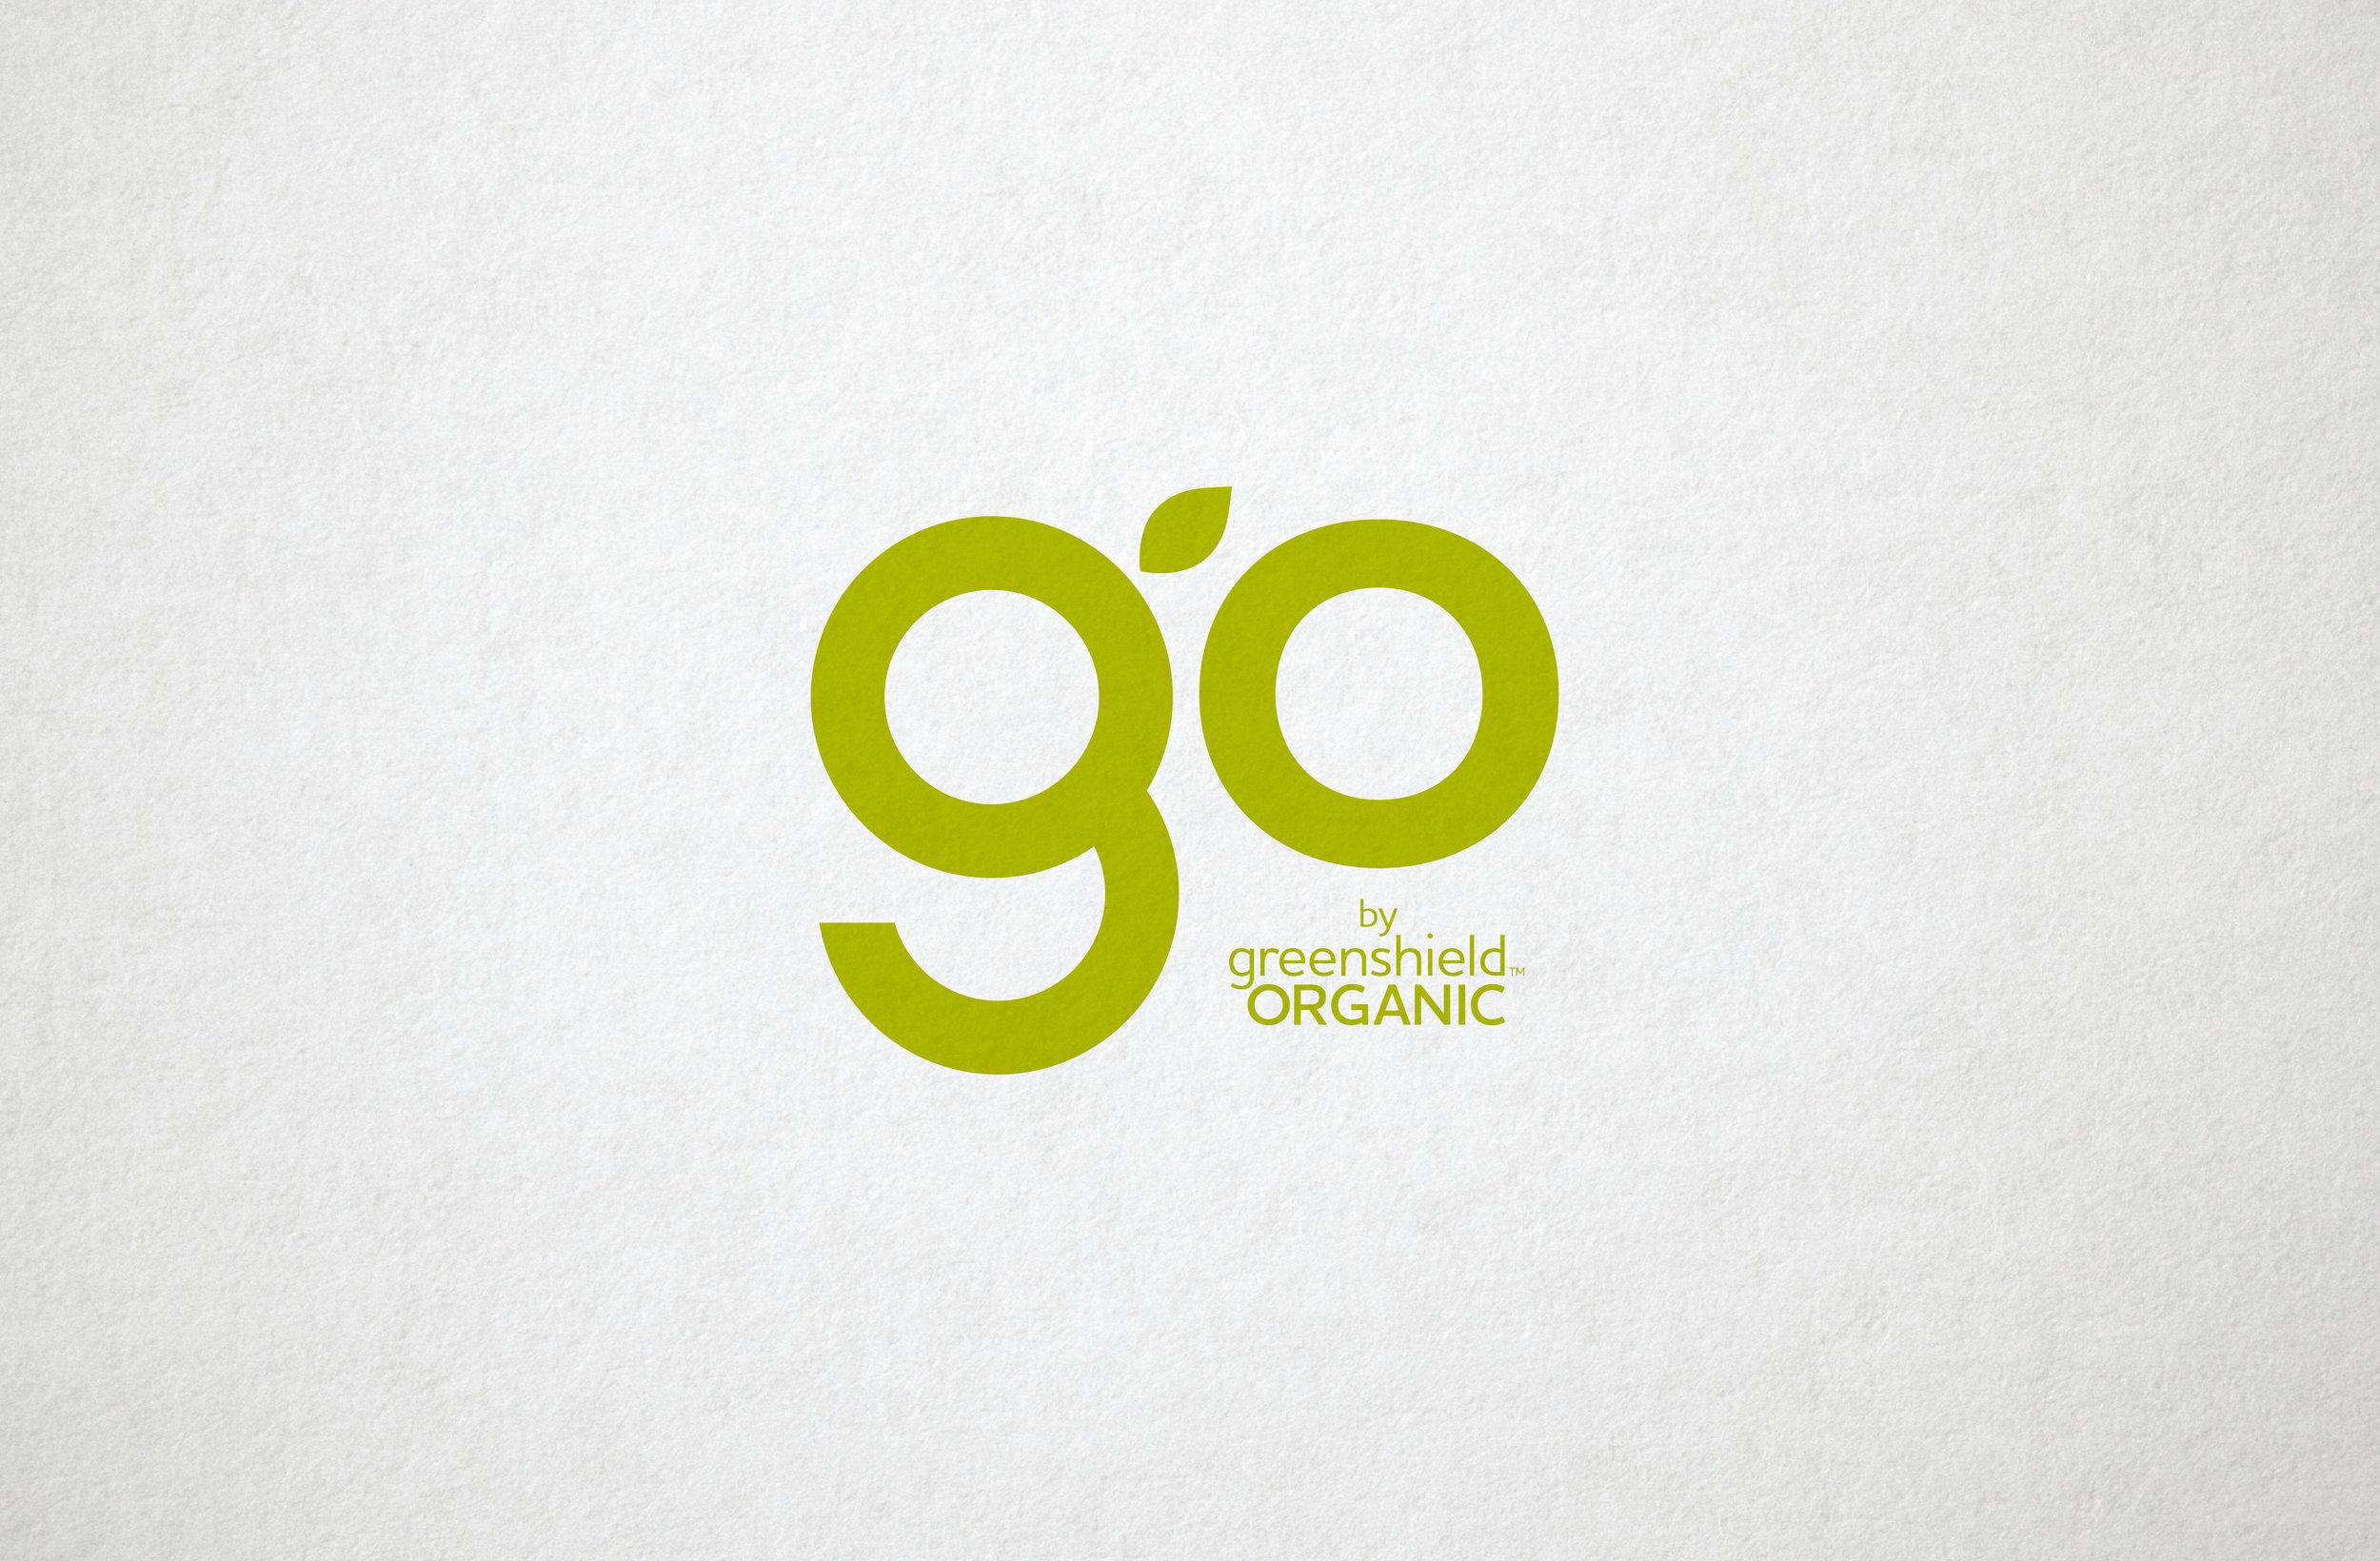 Greenshield_LogoOnPaper.jpg